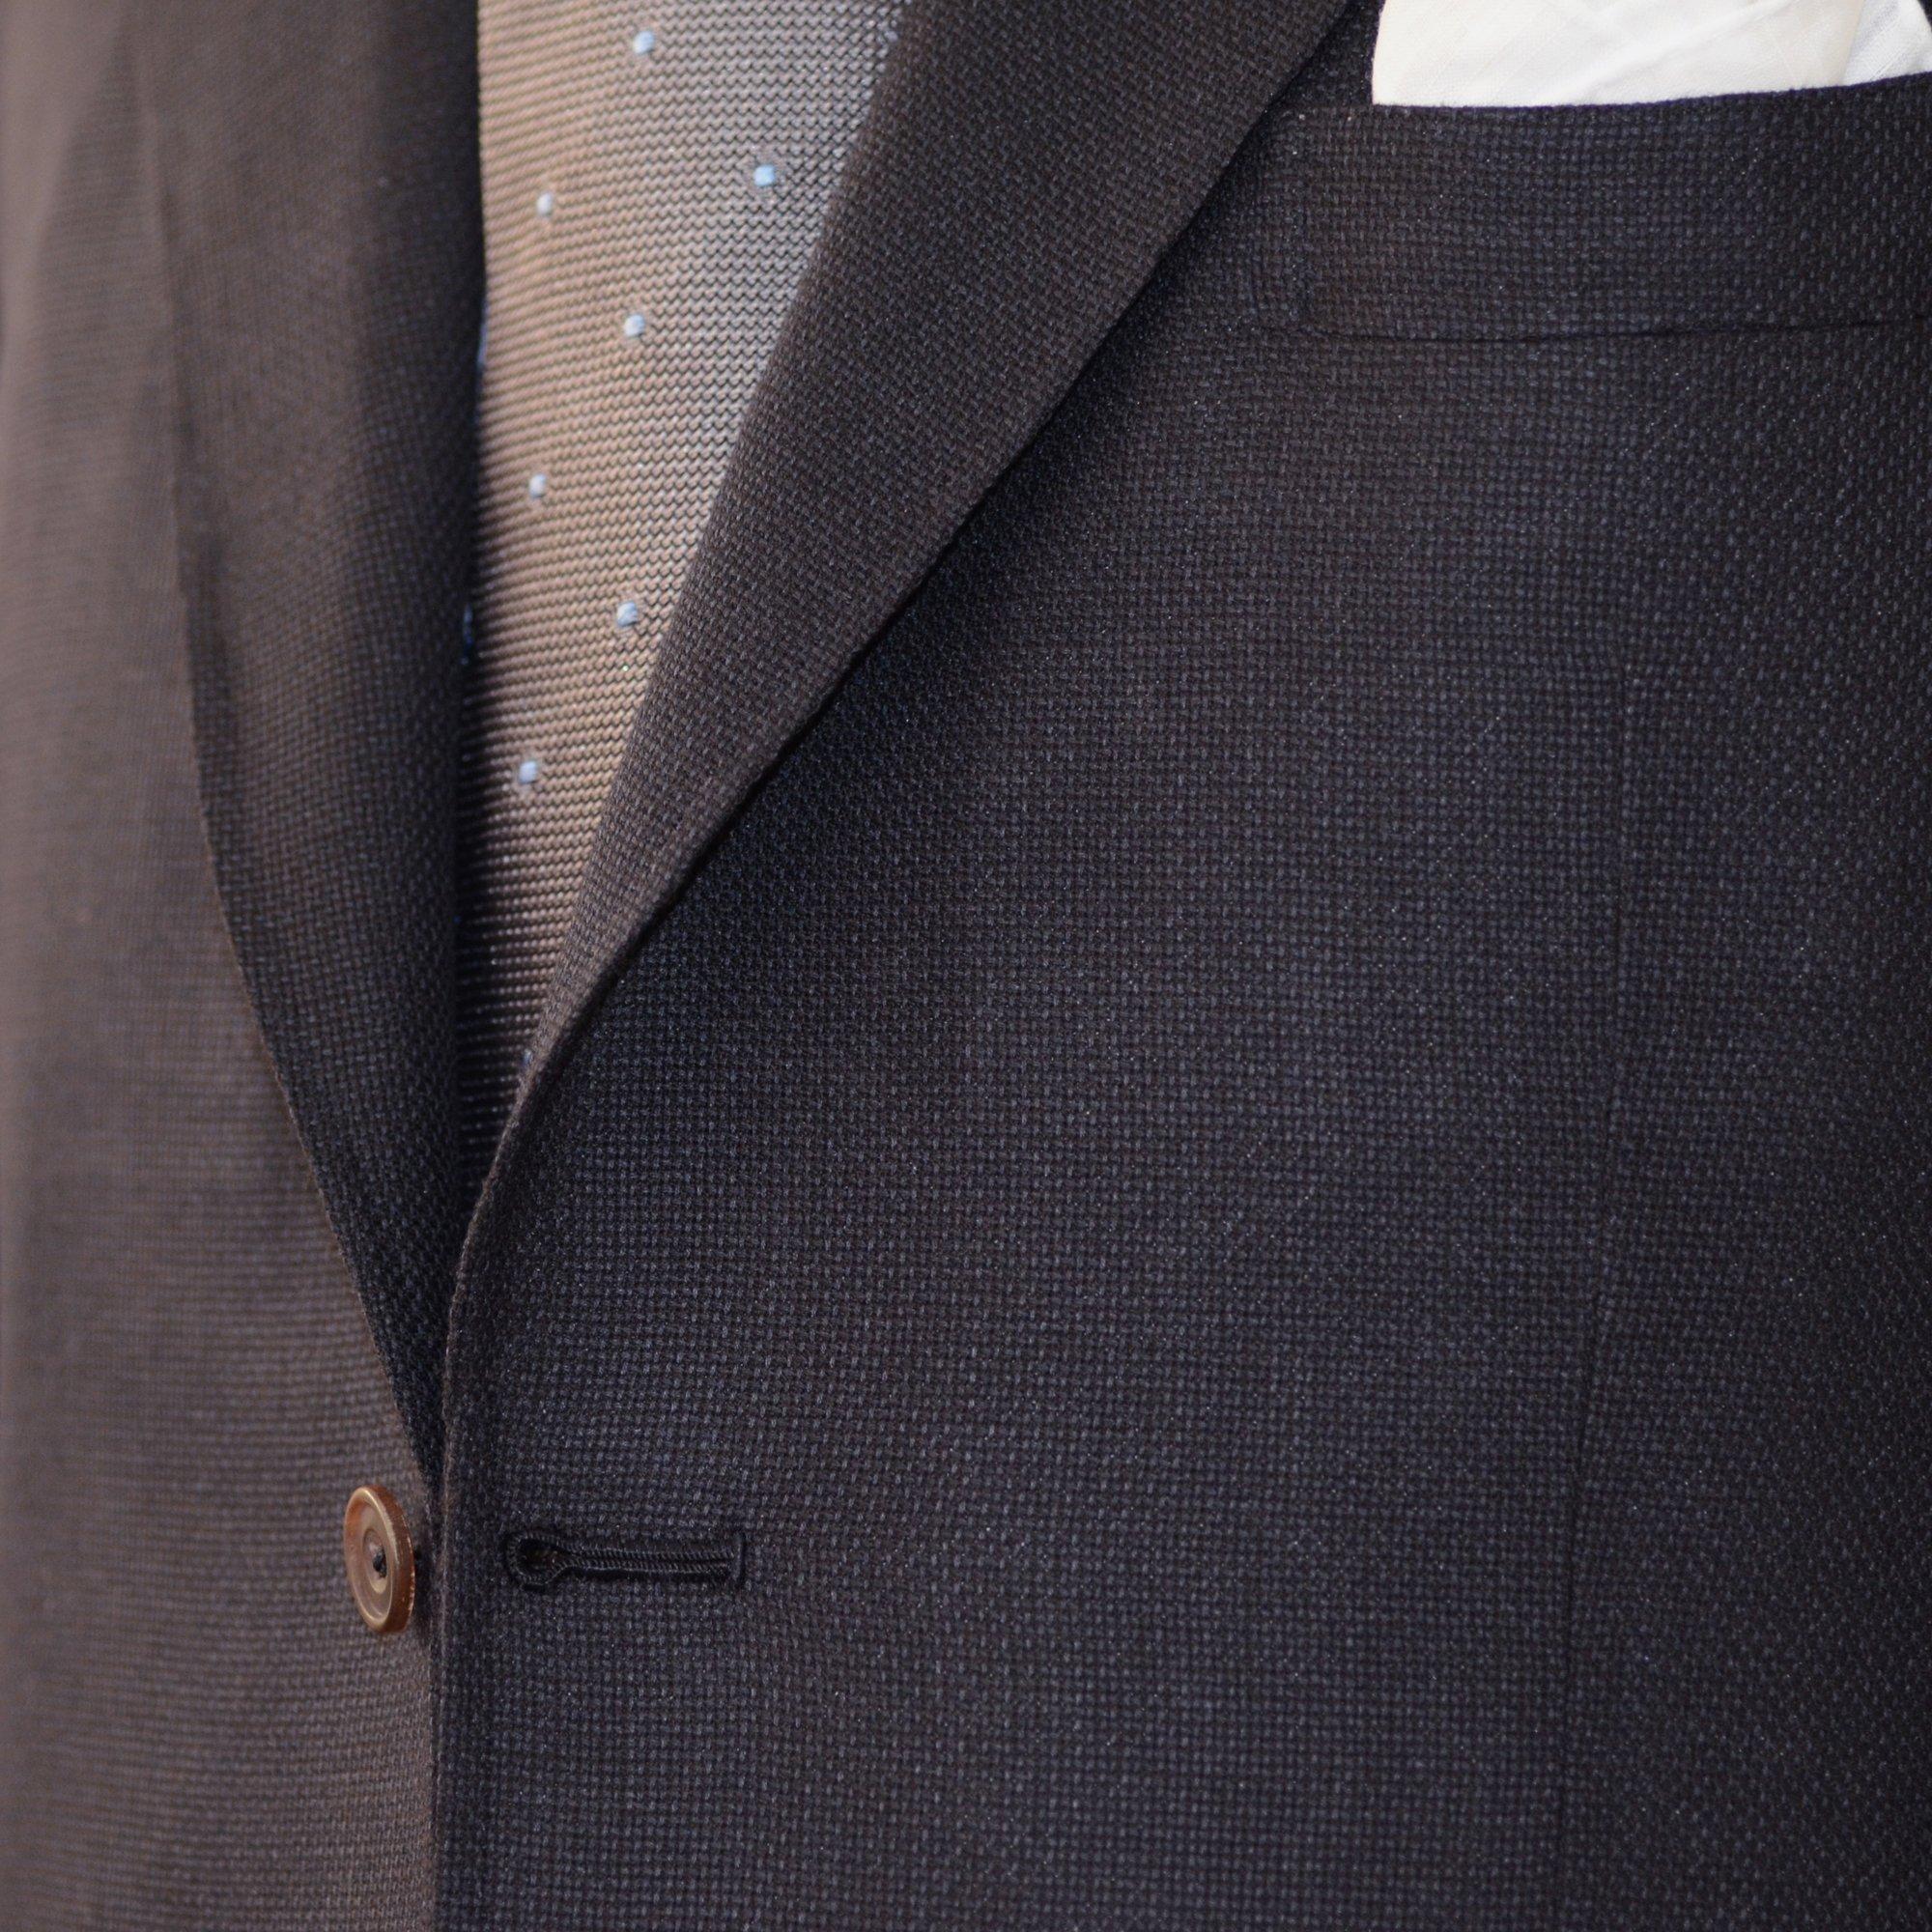 Sartoria Sciarra, bespoke tailor, bespoke jacket, Sydney bespoke tailor, Italian bespoke tailoring, soft tailoring, lapel roll, bespoke lapel, jacket lapel, hand pad stitched lapel, buffalo horn button, hand made button hole, silk button hole twist, navy bespoke jacket, cerruti navy wool and cashmere hopsack fabric, luxury bespoke, luxury tailoring, luxury jacket, luxury suit, luxury tailoring